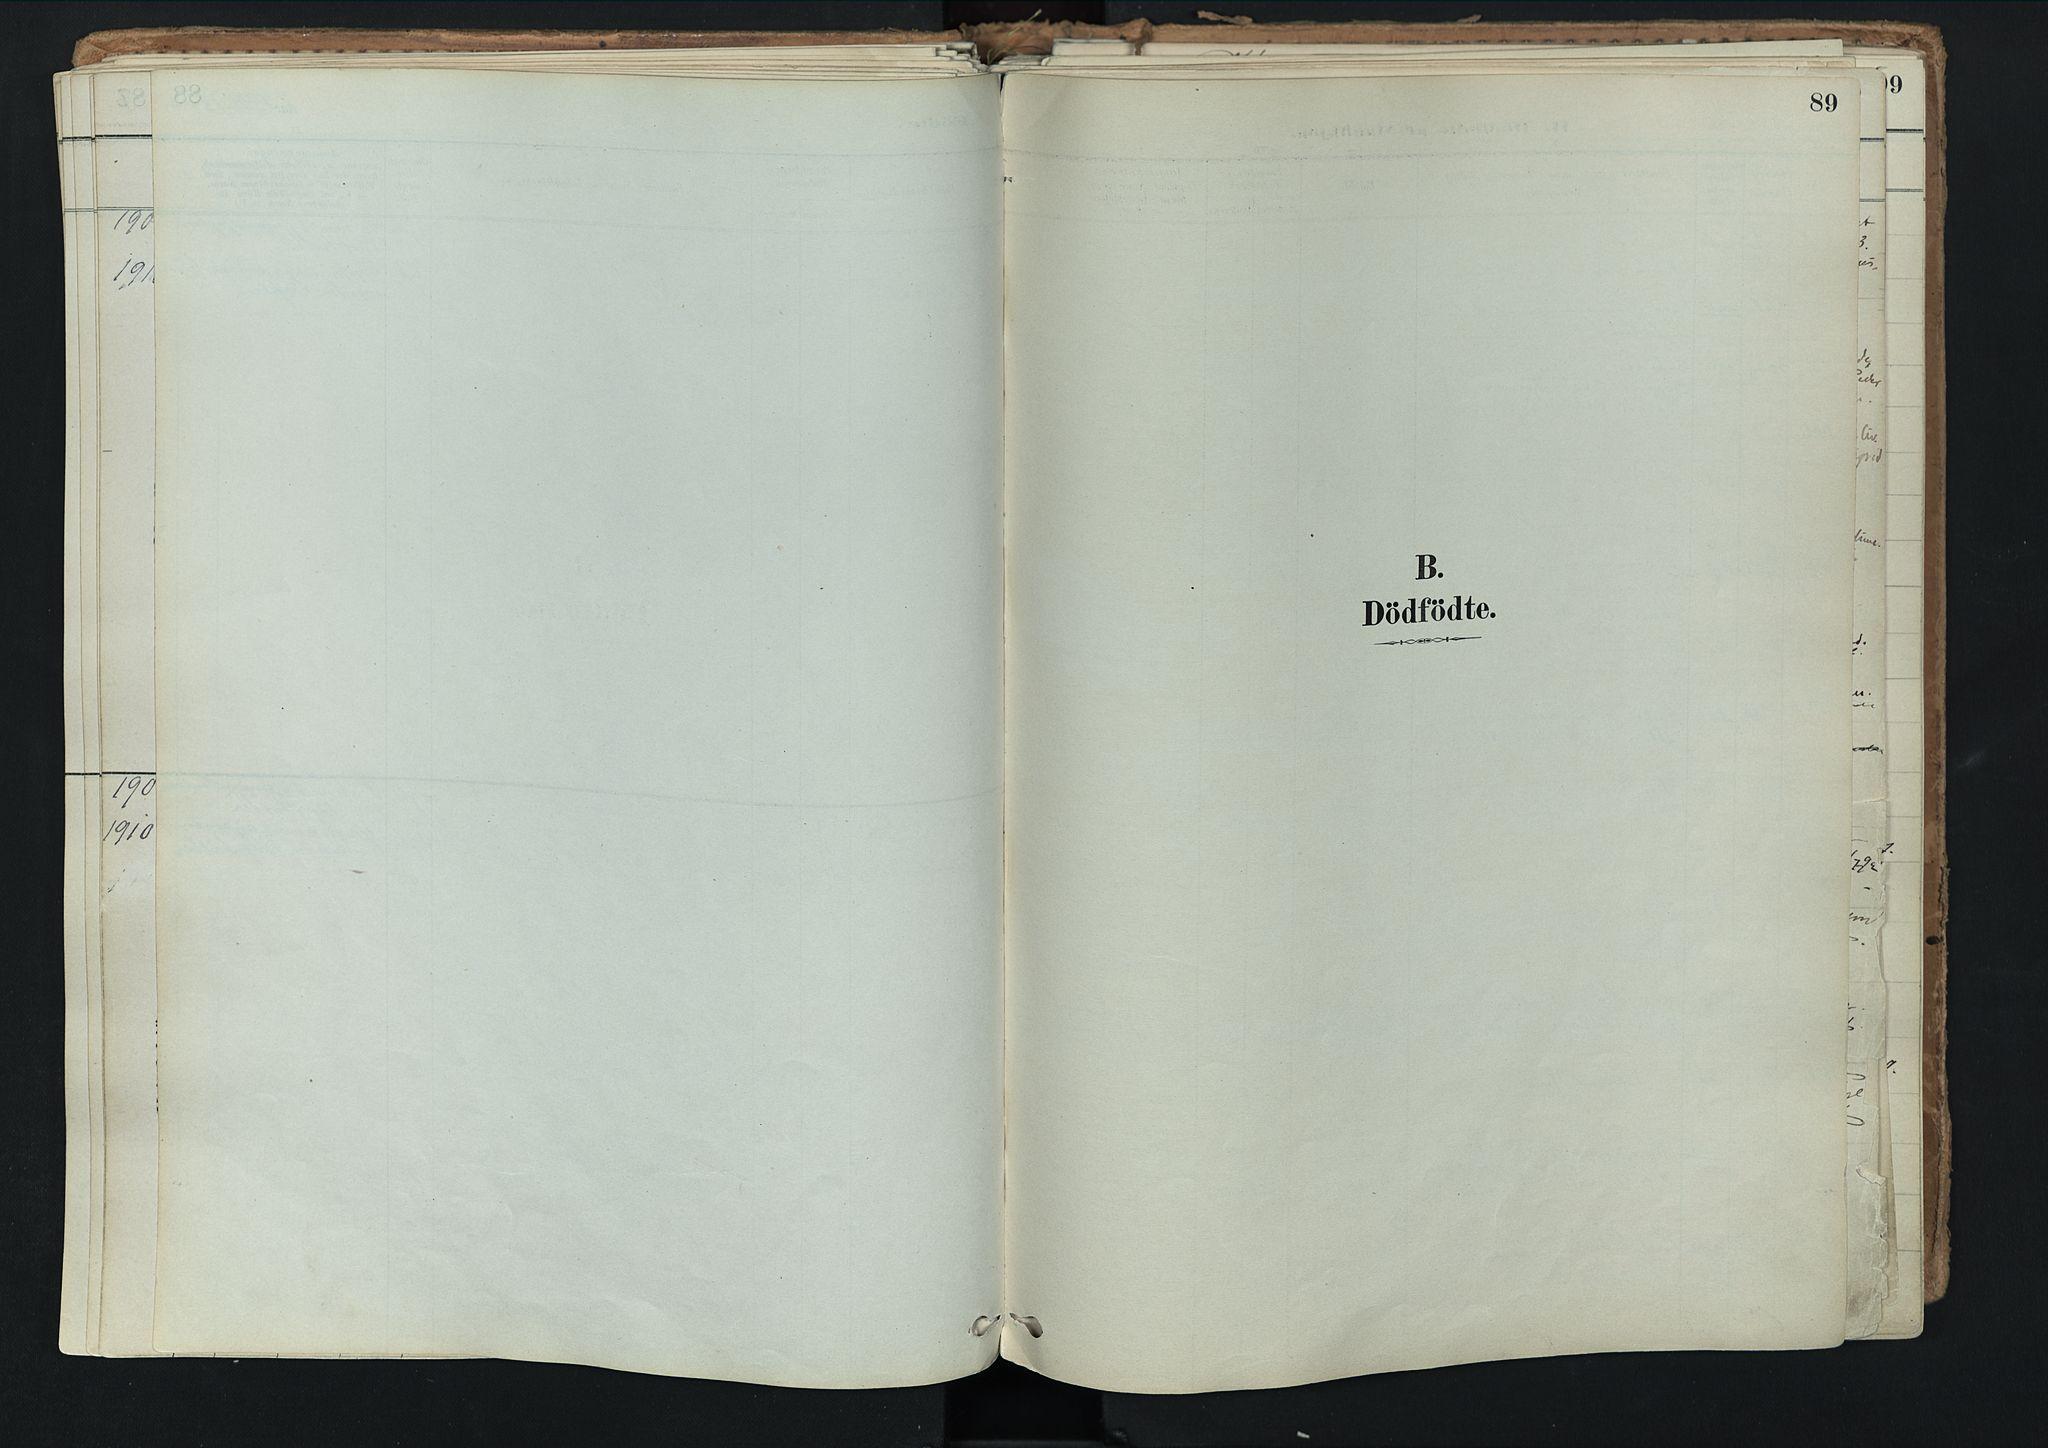 SAH, Nord-Fron prestekontor, Ministerialbok nr. 3, 1884-1914, s. 89